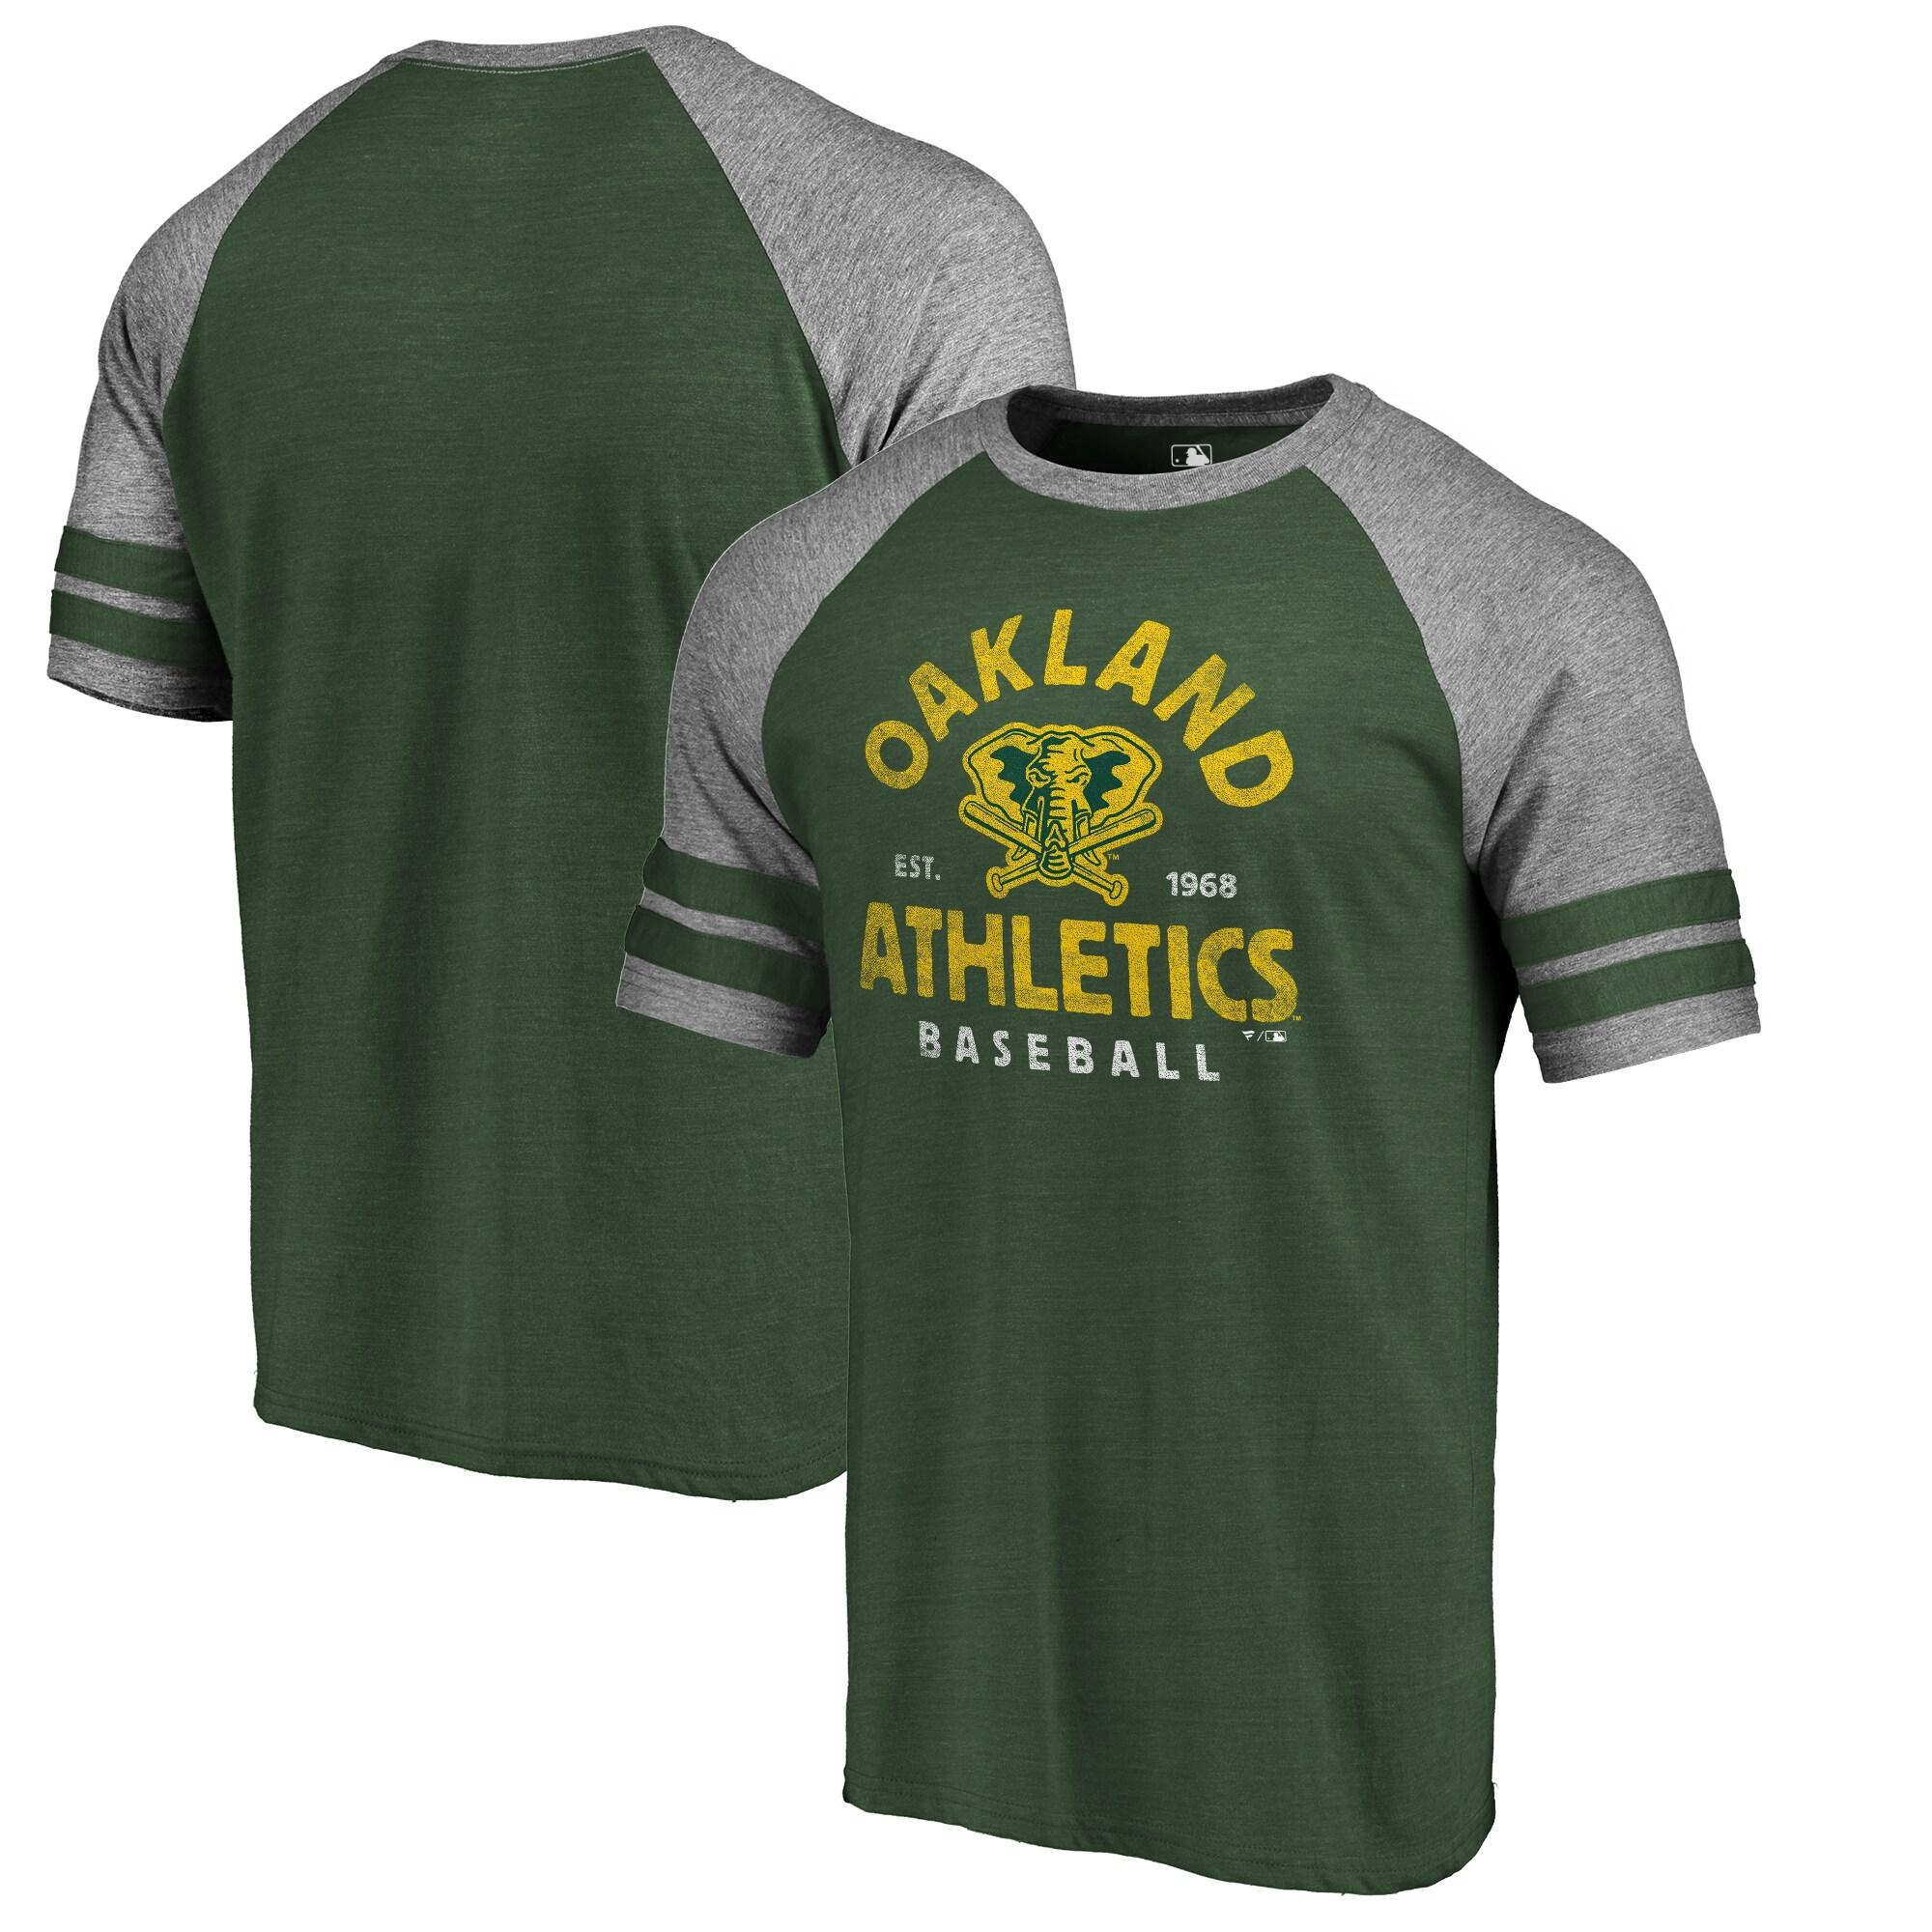 Oakland Athletics Fanatics Branded Cooperstown Collection Vintage Arch Tri-Blend Raglan T-Shirt - Green